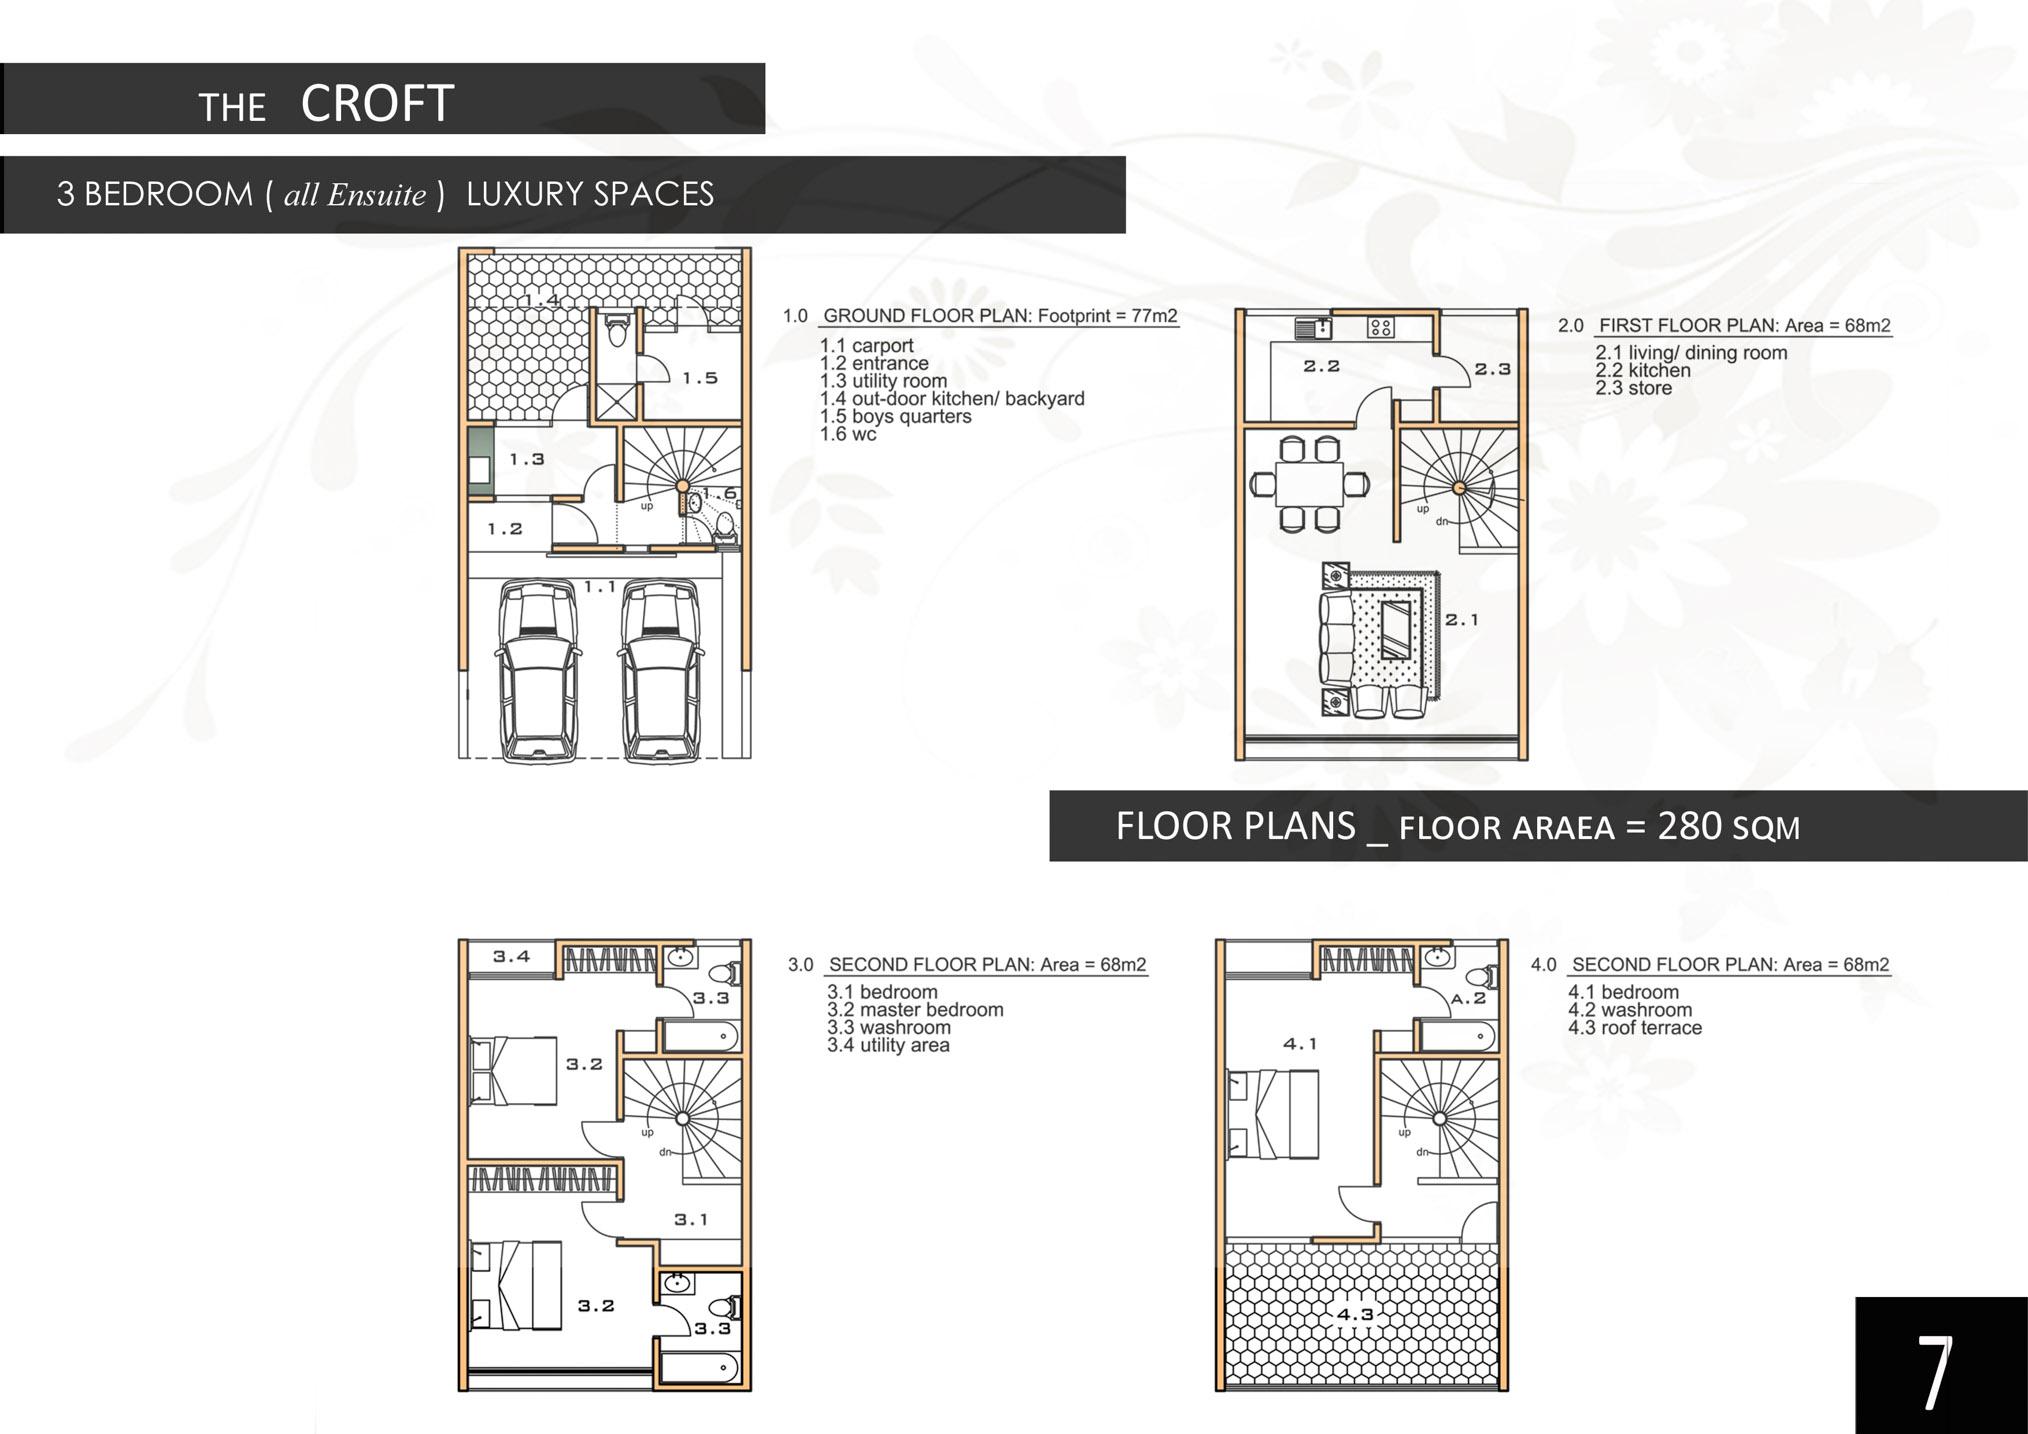 Mayfair-Court-Agringanor-Floor-Plan-The-Croft-I